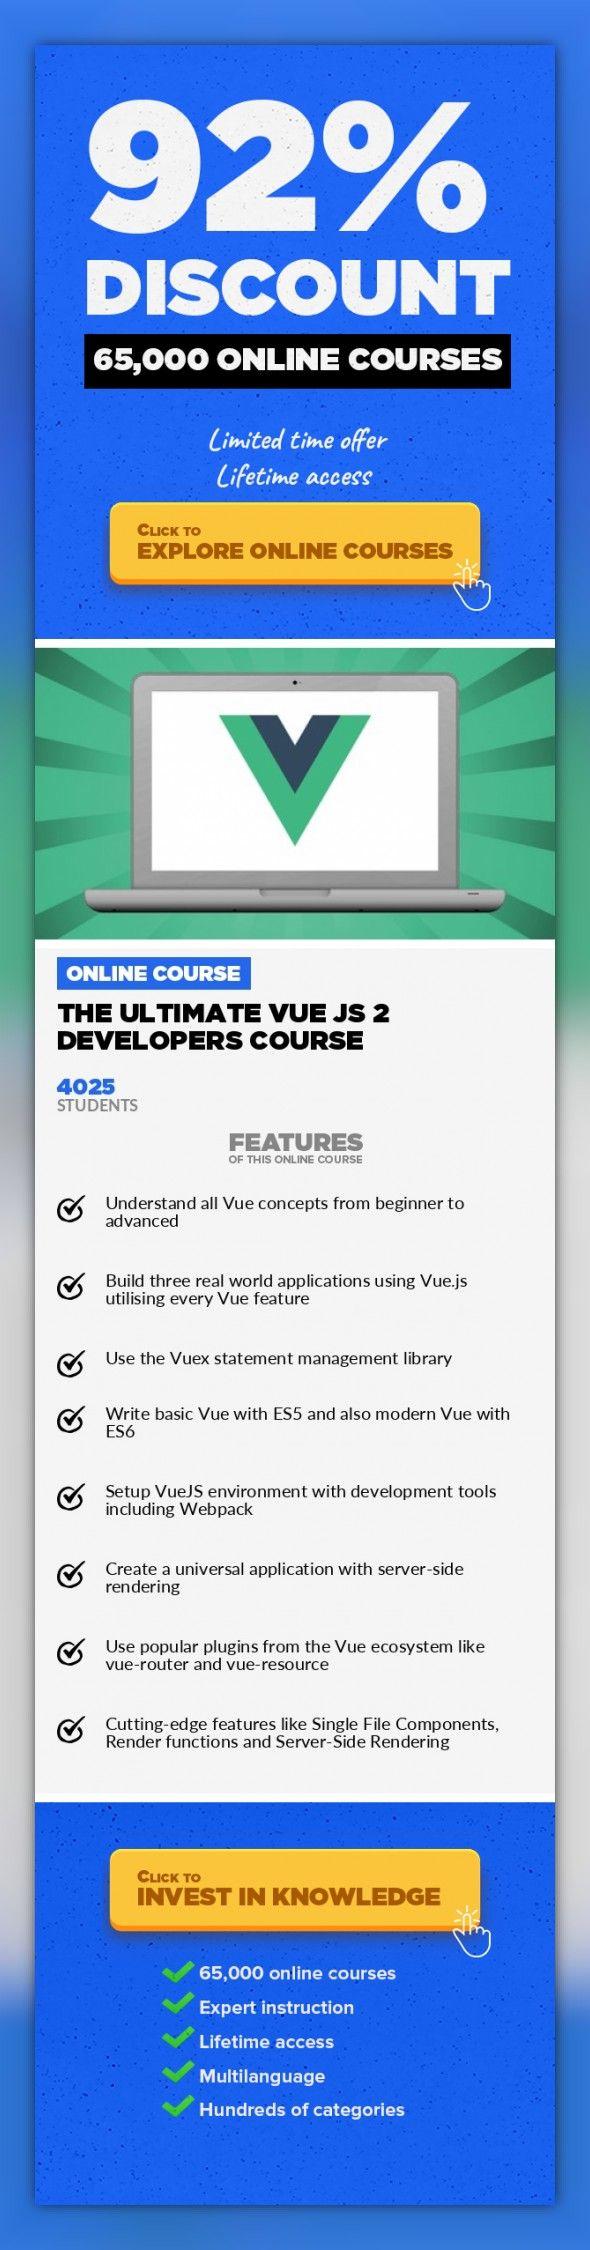 the ultimate vue js 2 developers course web development development